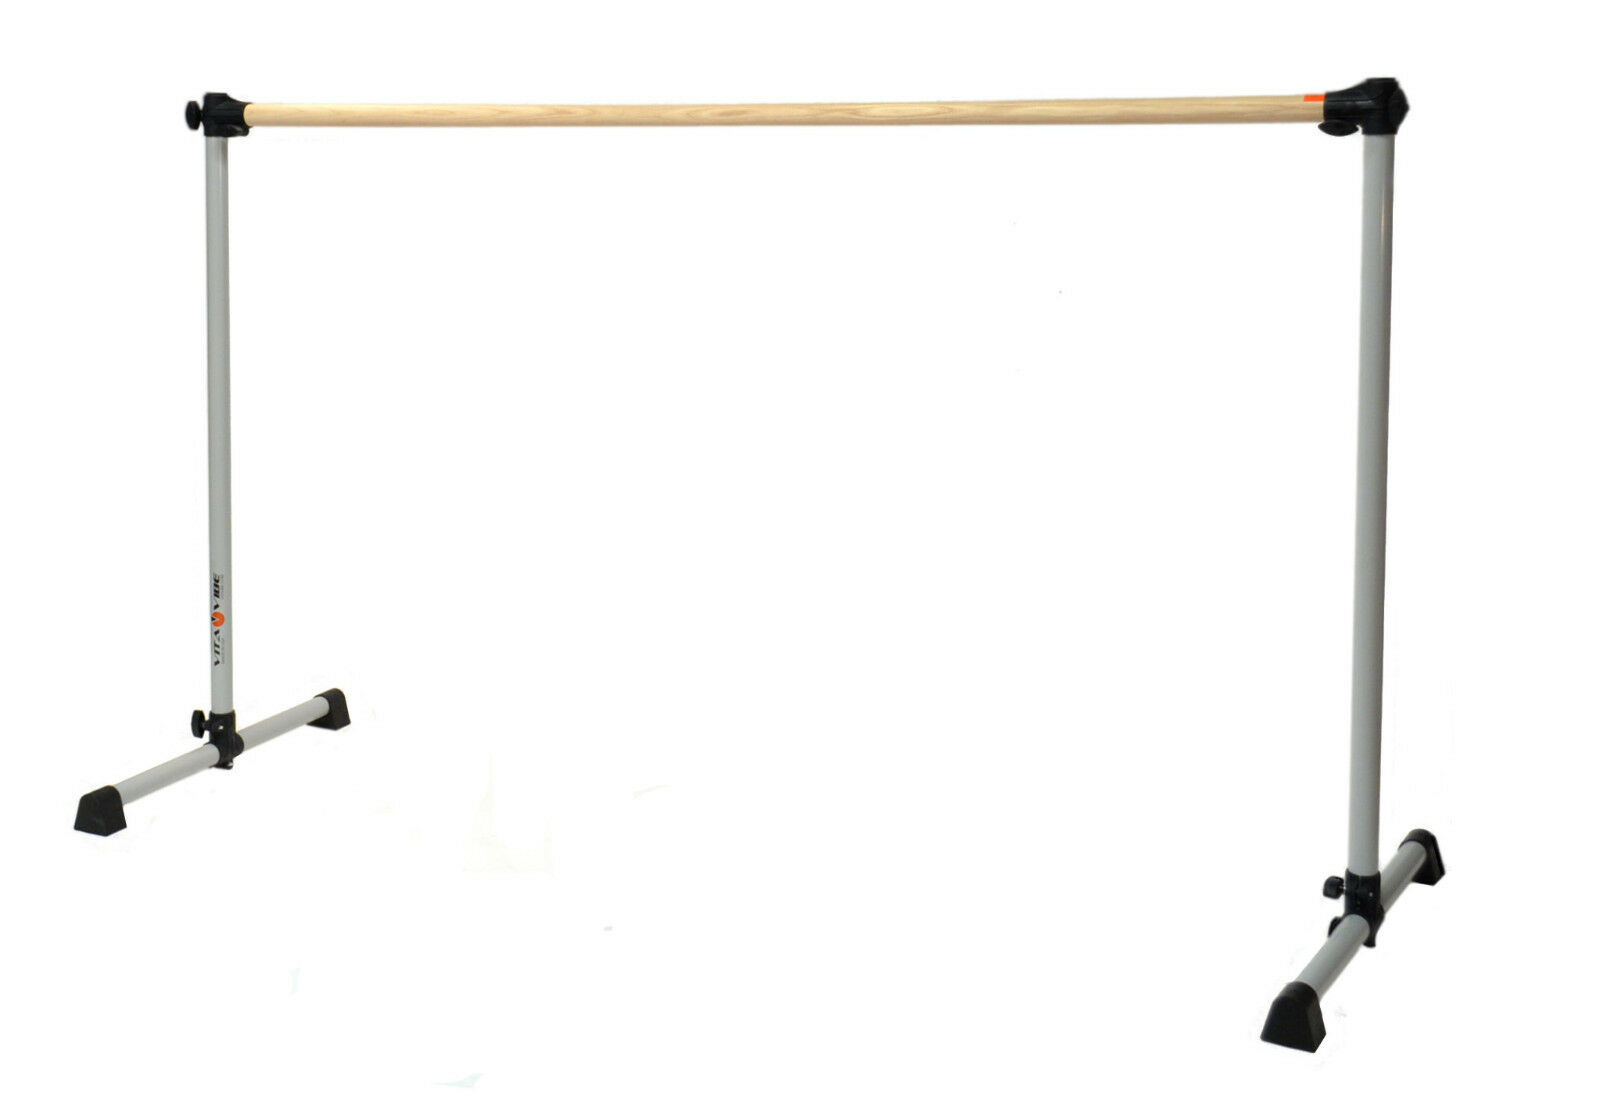 Ballet Barre B48-W Portable 4ft Wood Single Bar-Stretch/Dance Bar-Stretch/Dance Single Bar-Vita Vibe NEW febc92